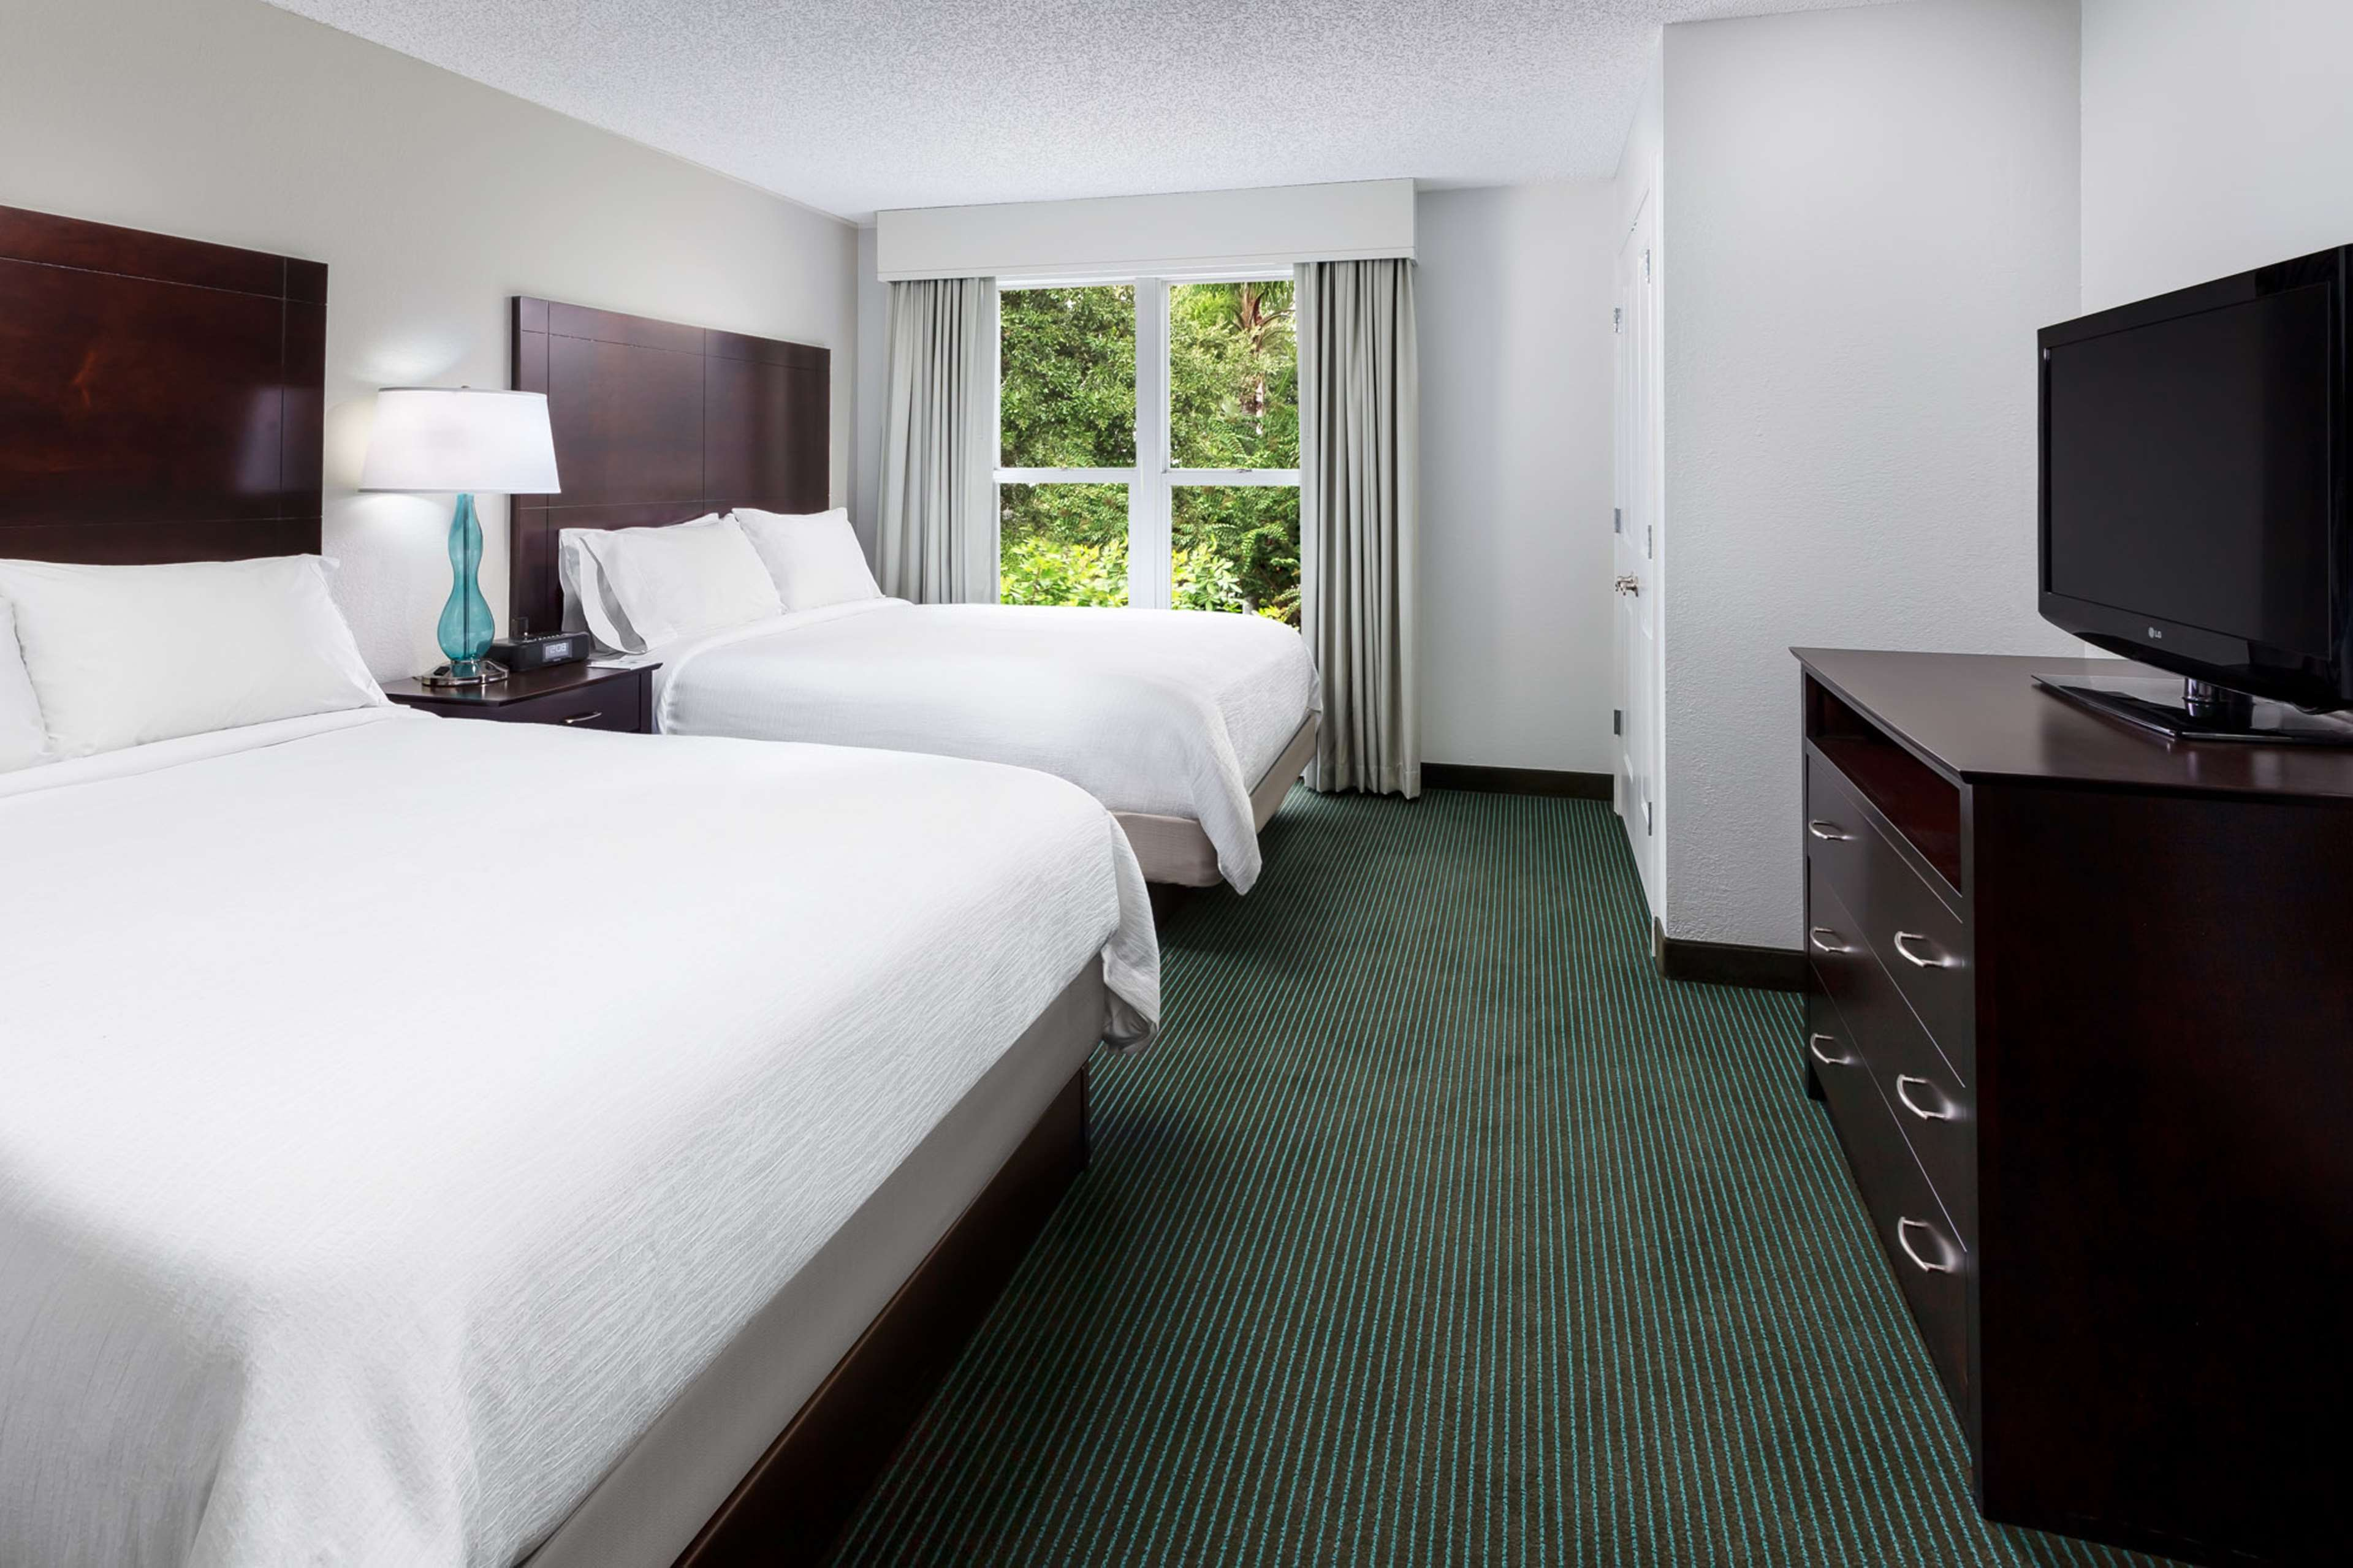 Embassy Suites by Hilton Orlando Lake Buena Vista Resort image 20